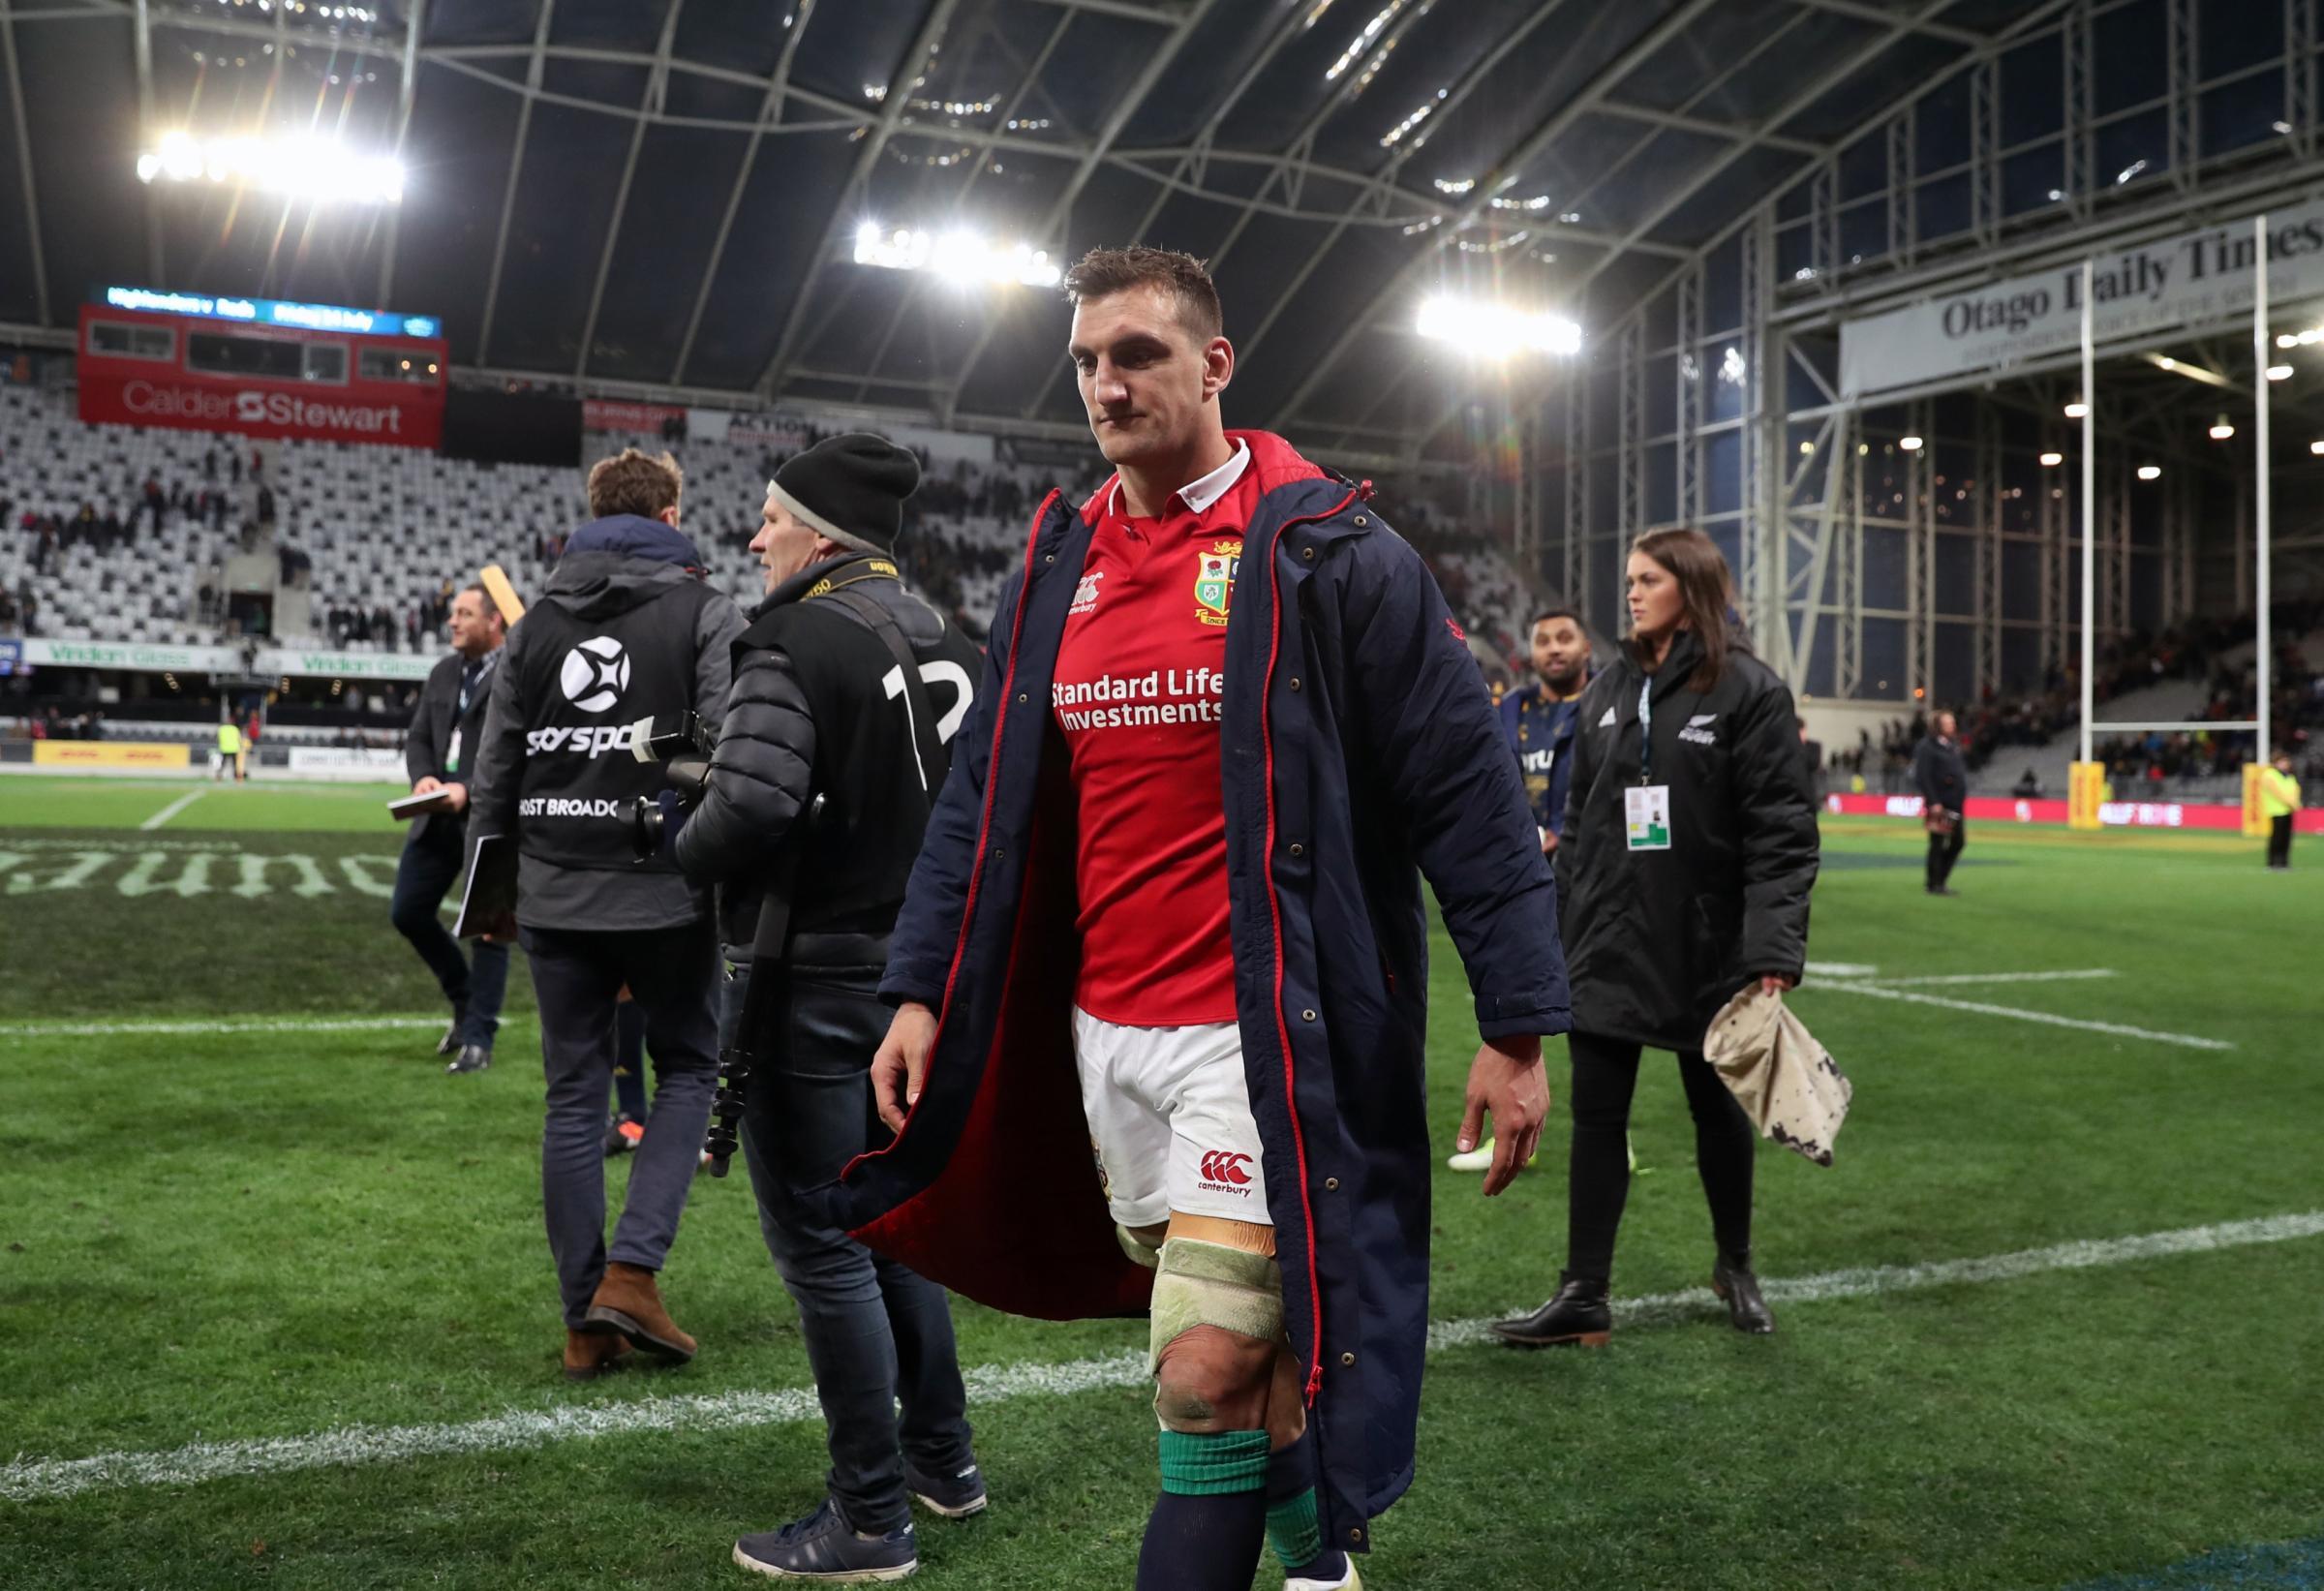 Lions coach Gatland rails at New Zealand 'blocking'